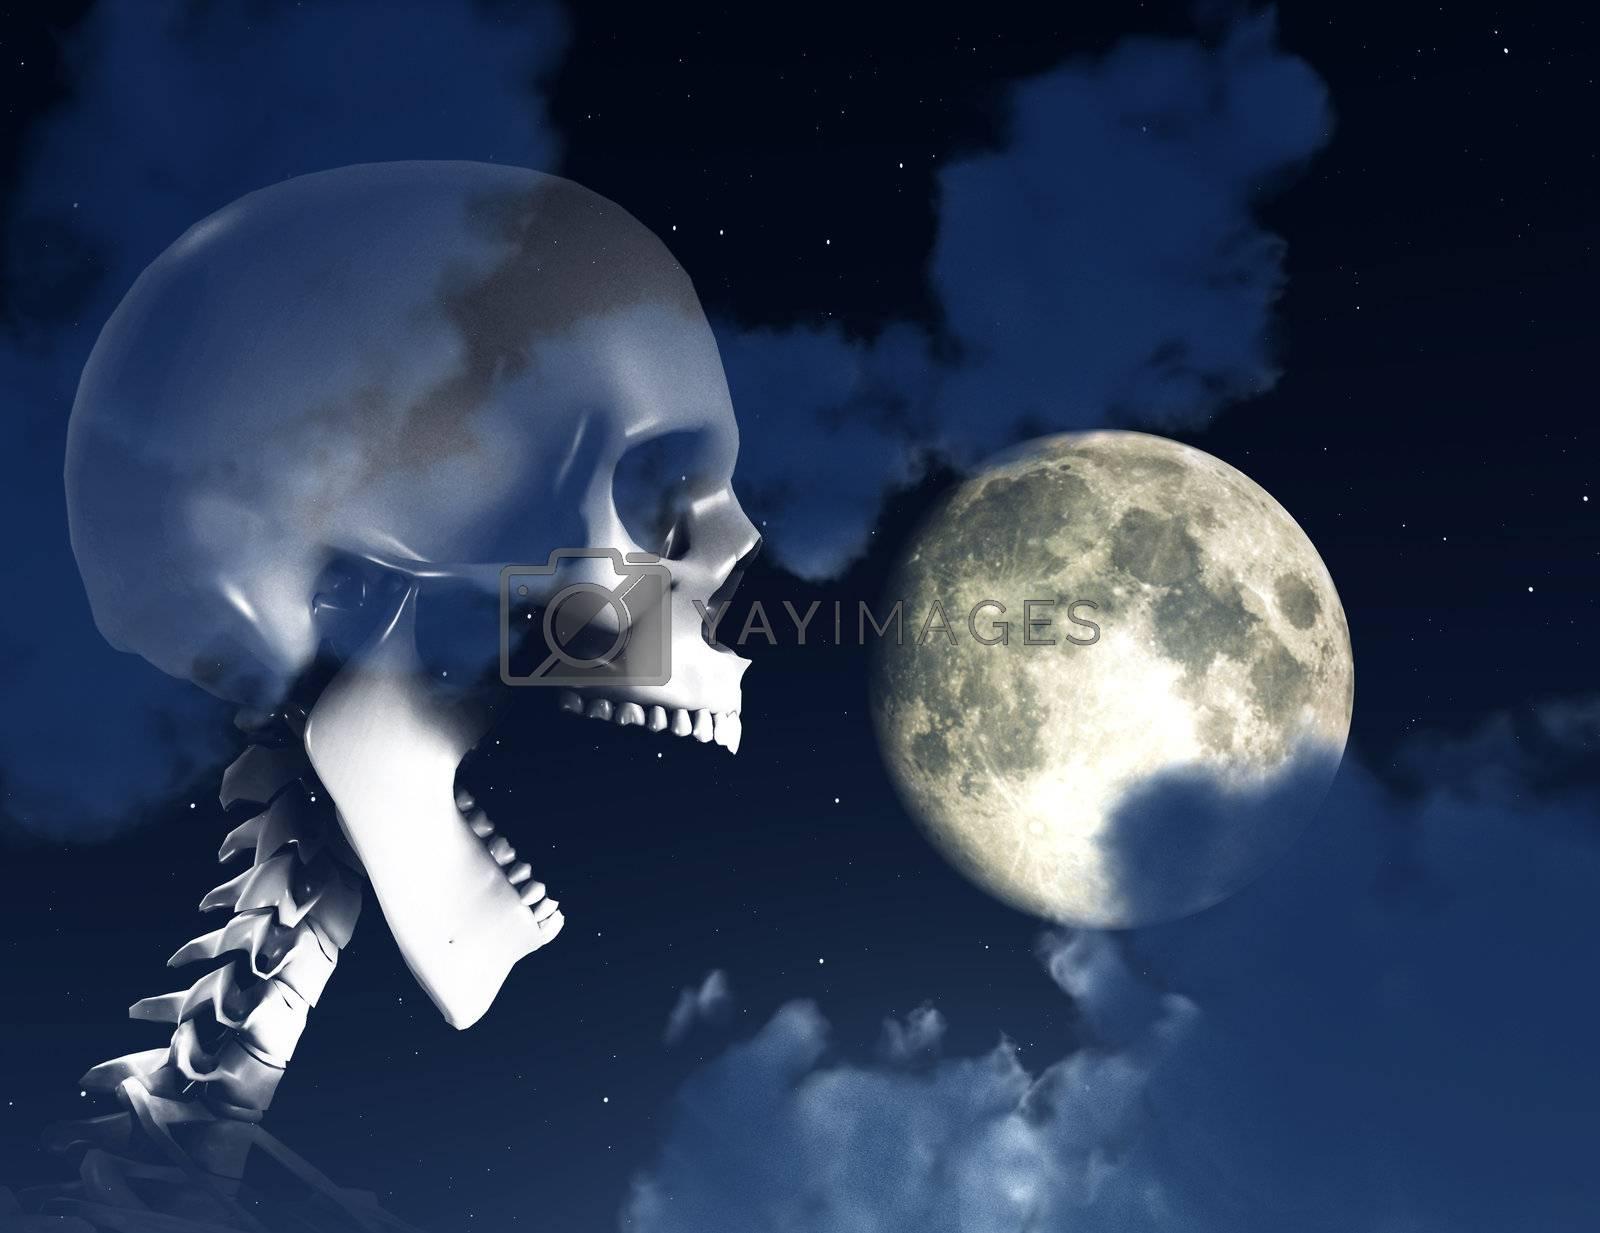 Royalty free image of Shouting Skeleton And Nighttime Sky by harveysart